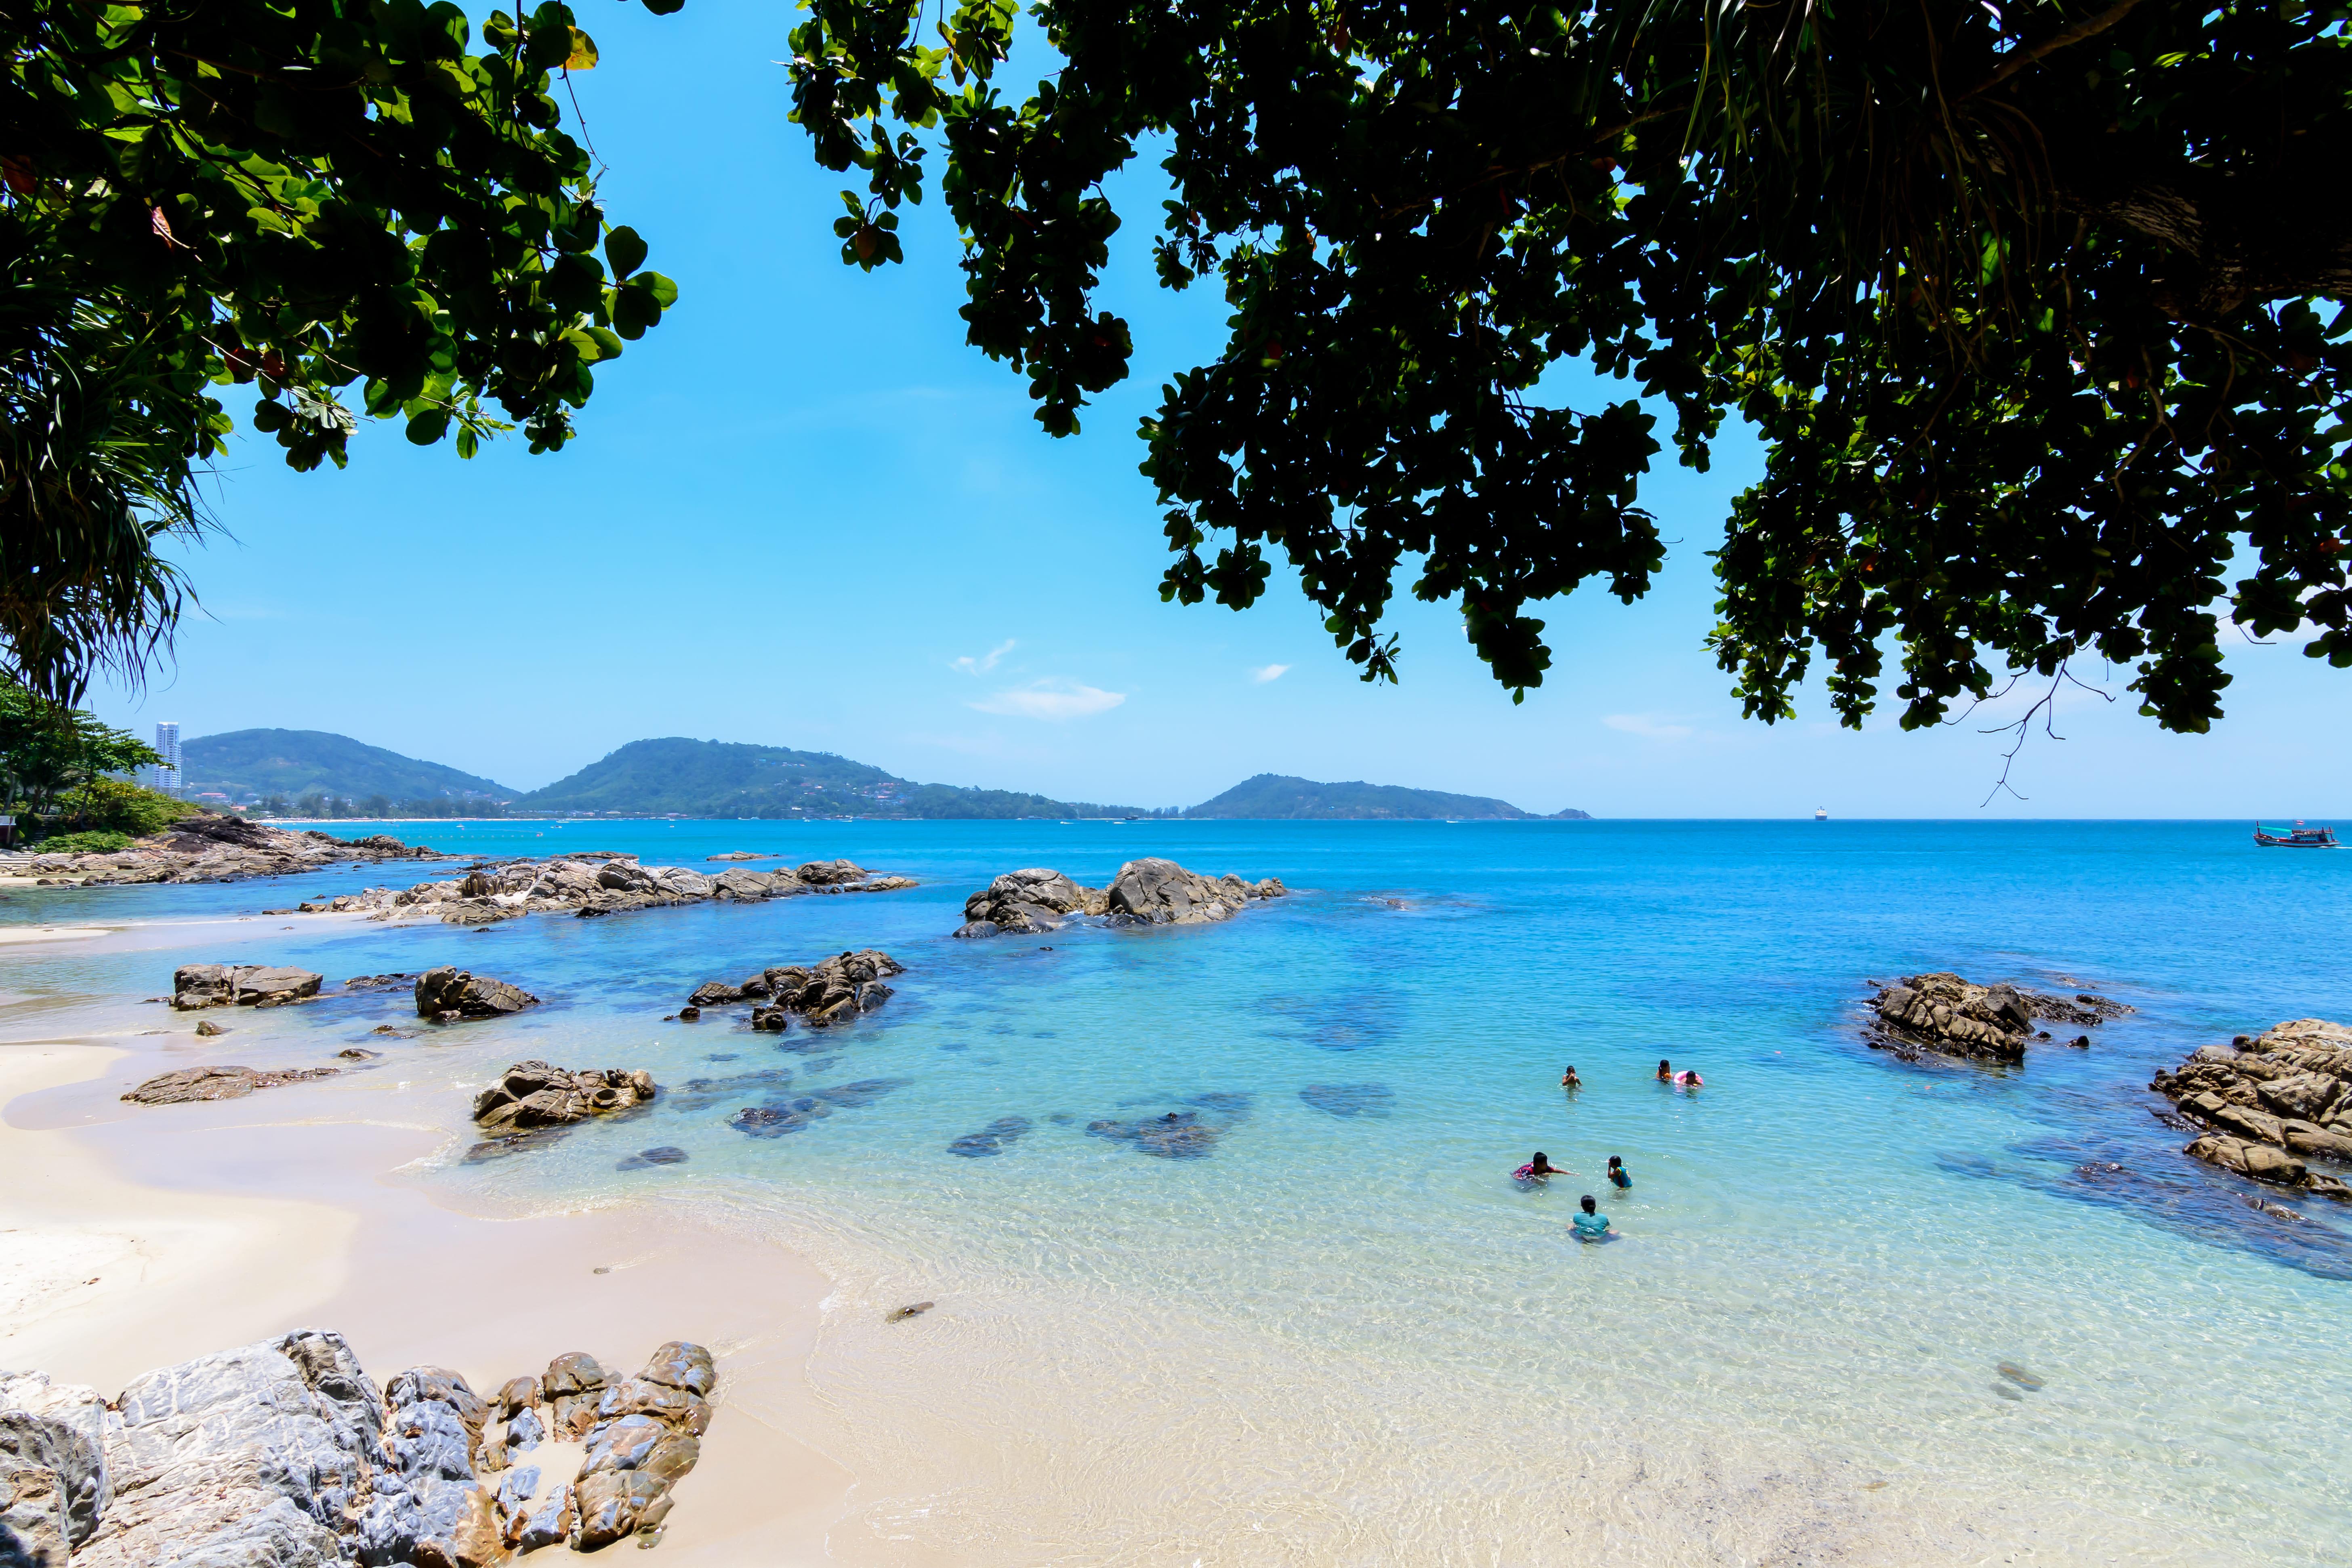 Pa-tong Beach